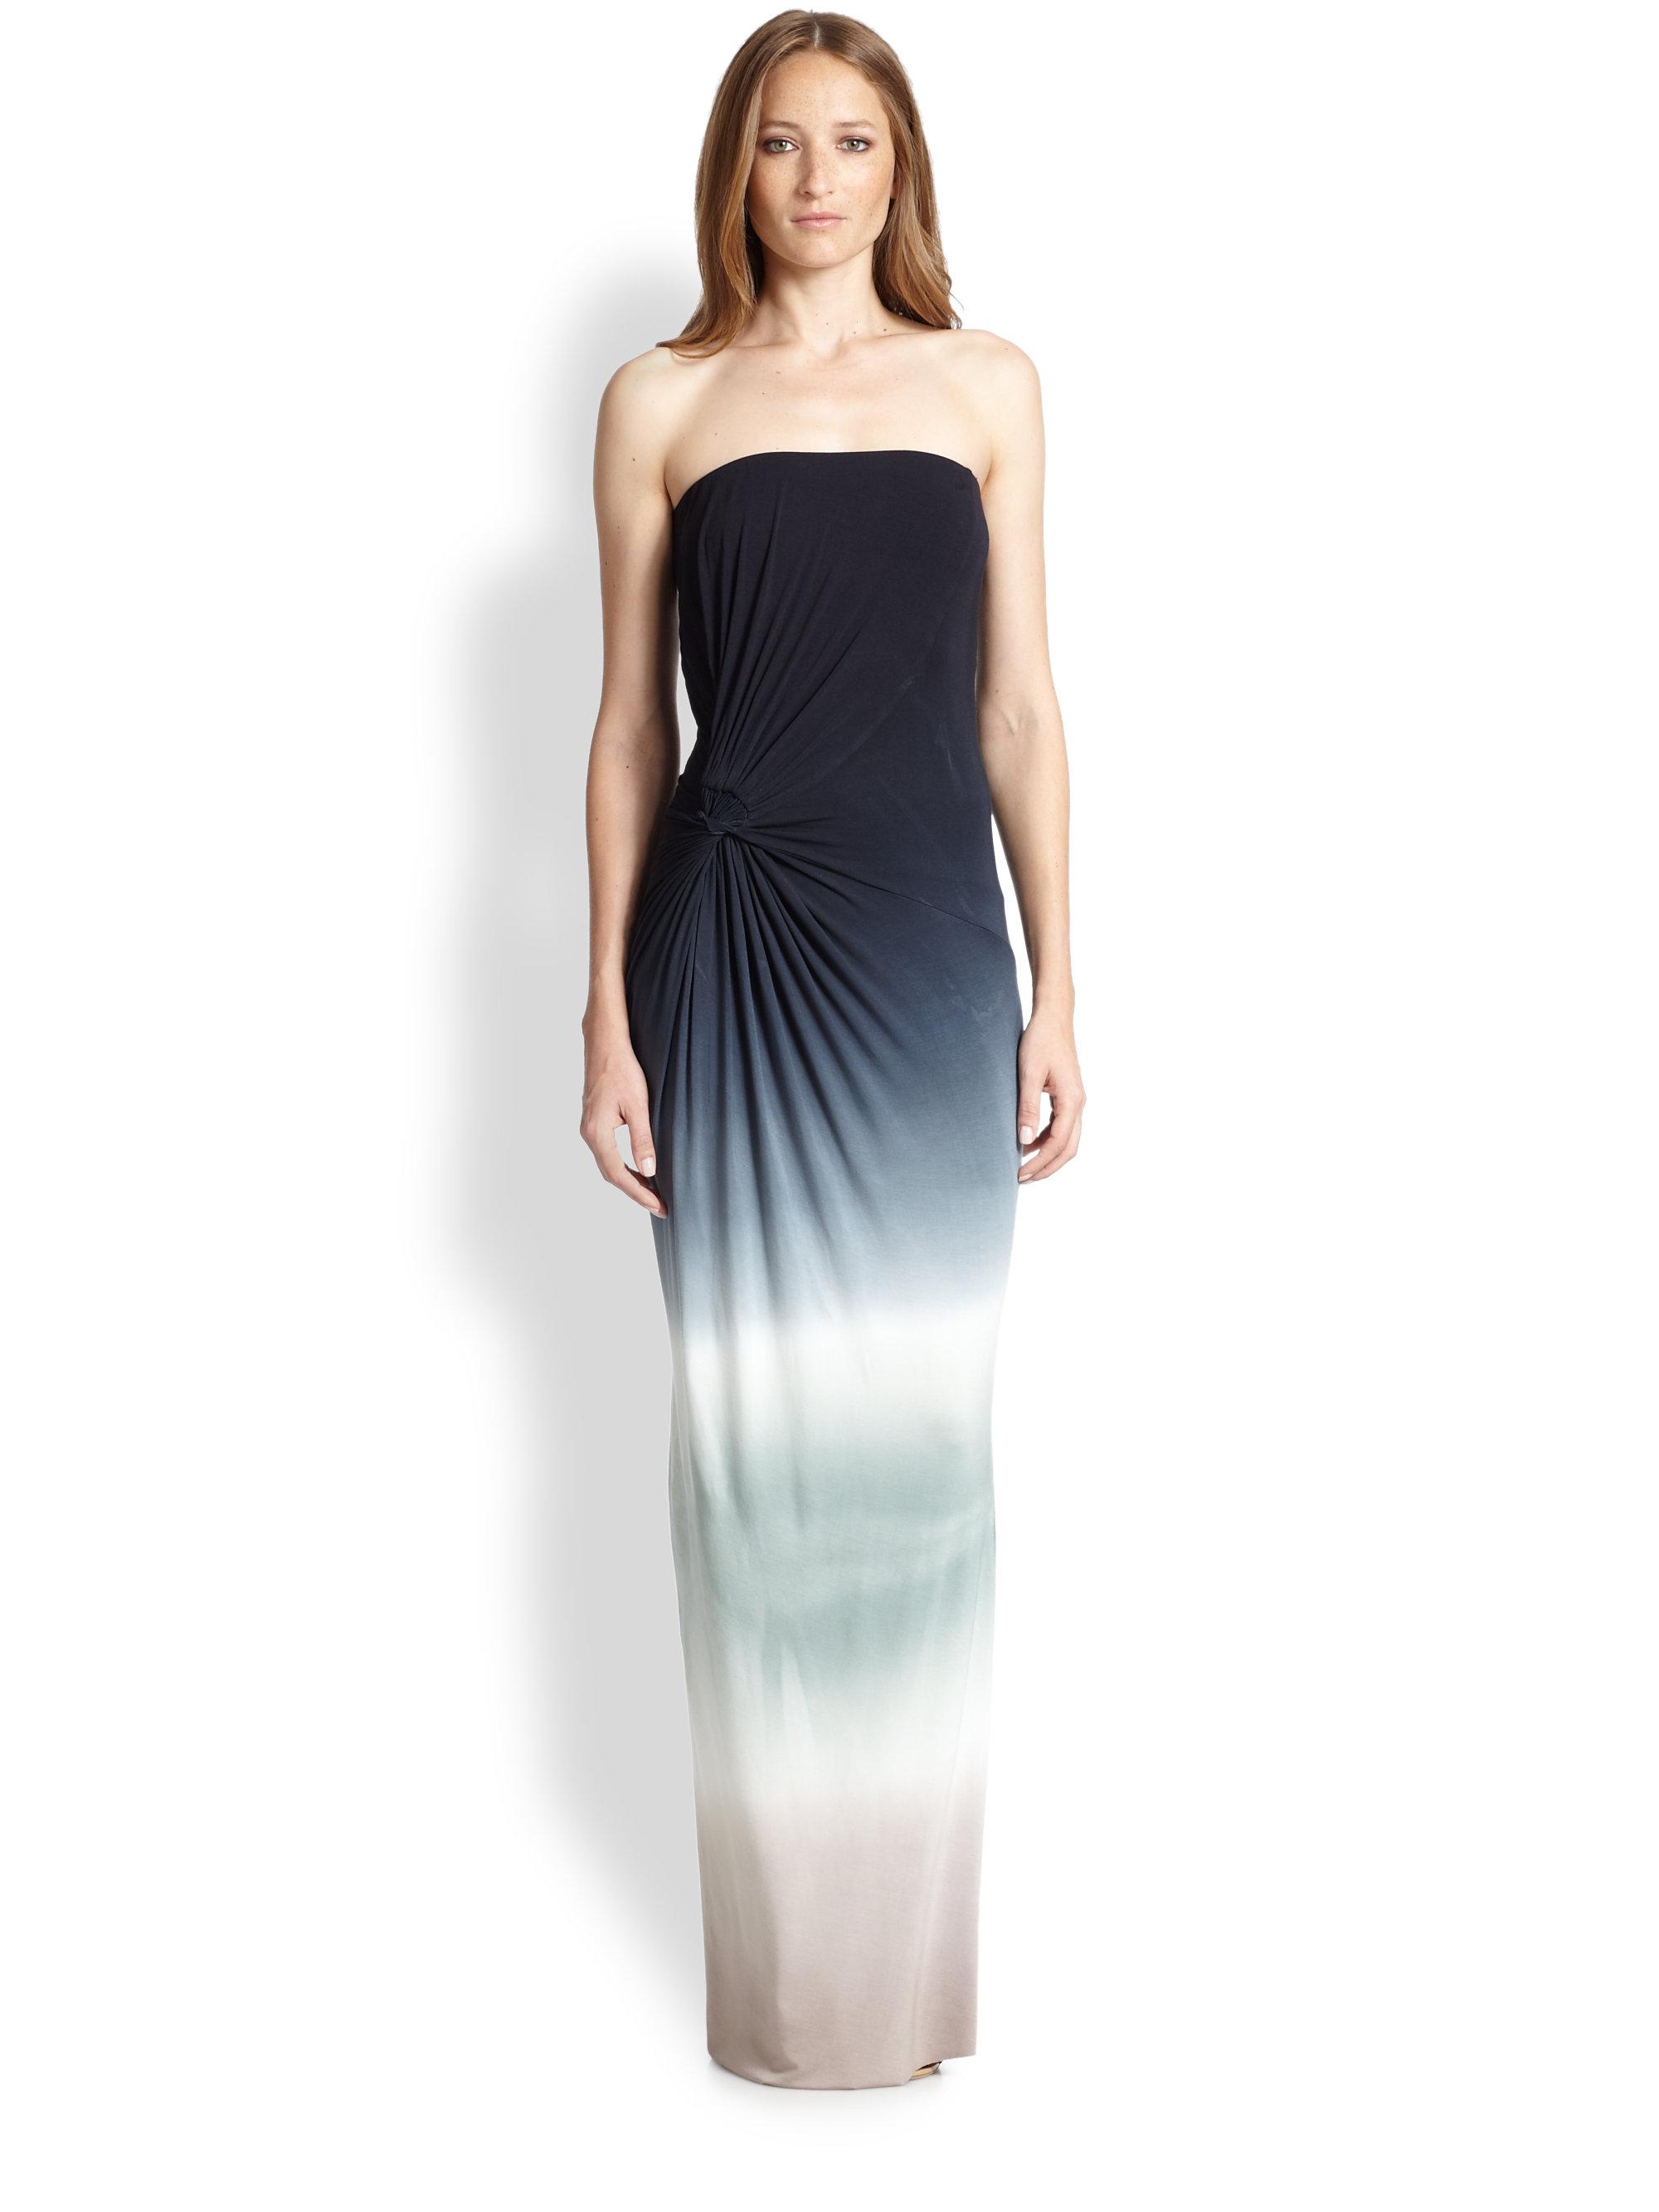 Lyst - Young Fabulous & Broke Chandra OmbrÉ Maxi Dress